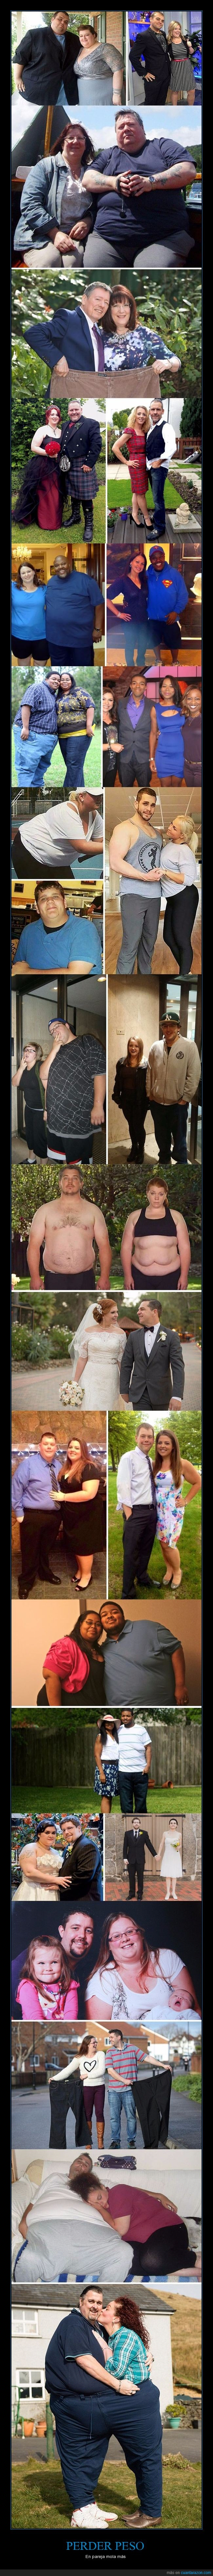 adelgazar,flacos,obesos,perder peso